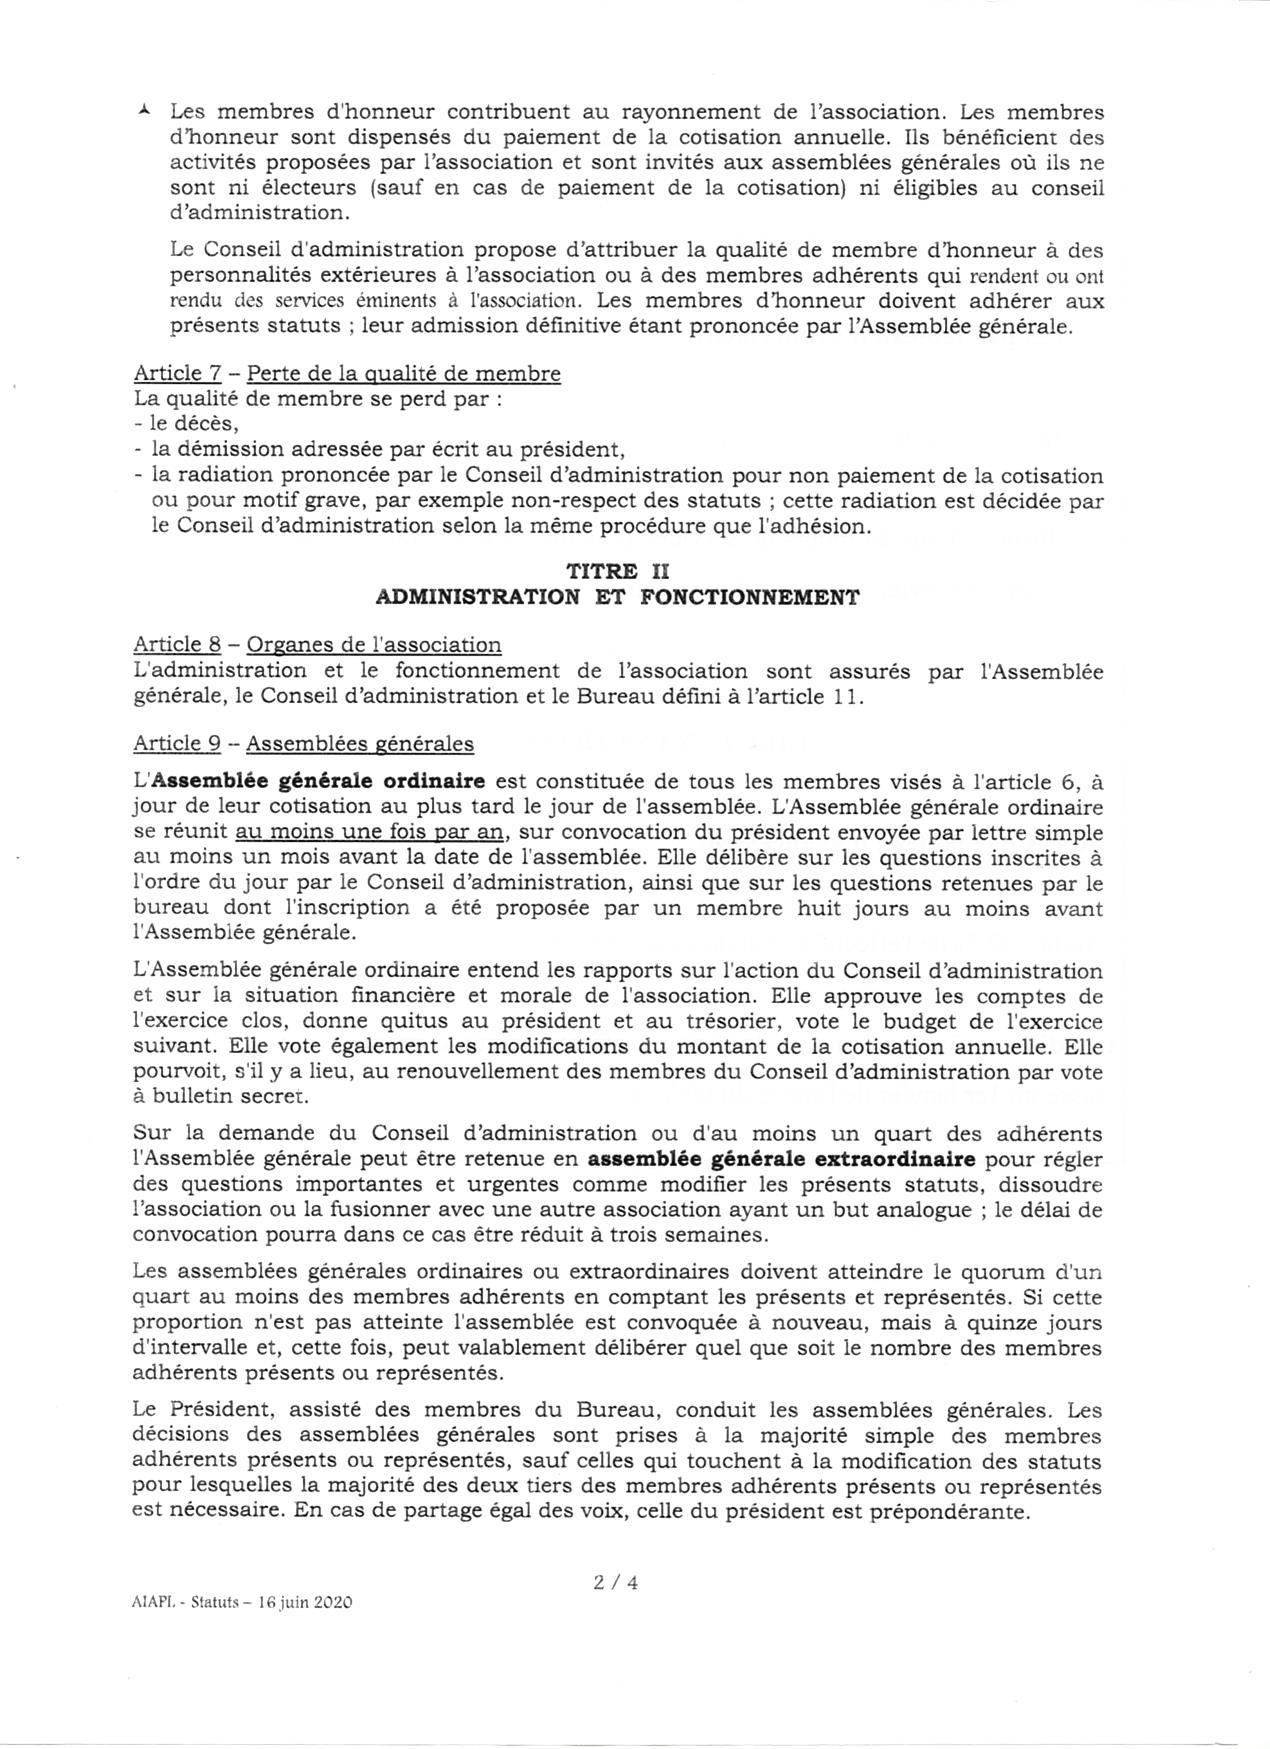 statuts Loti p2